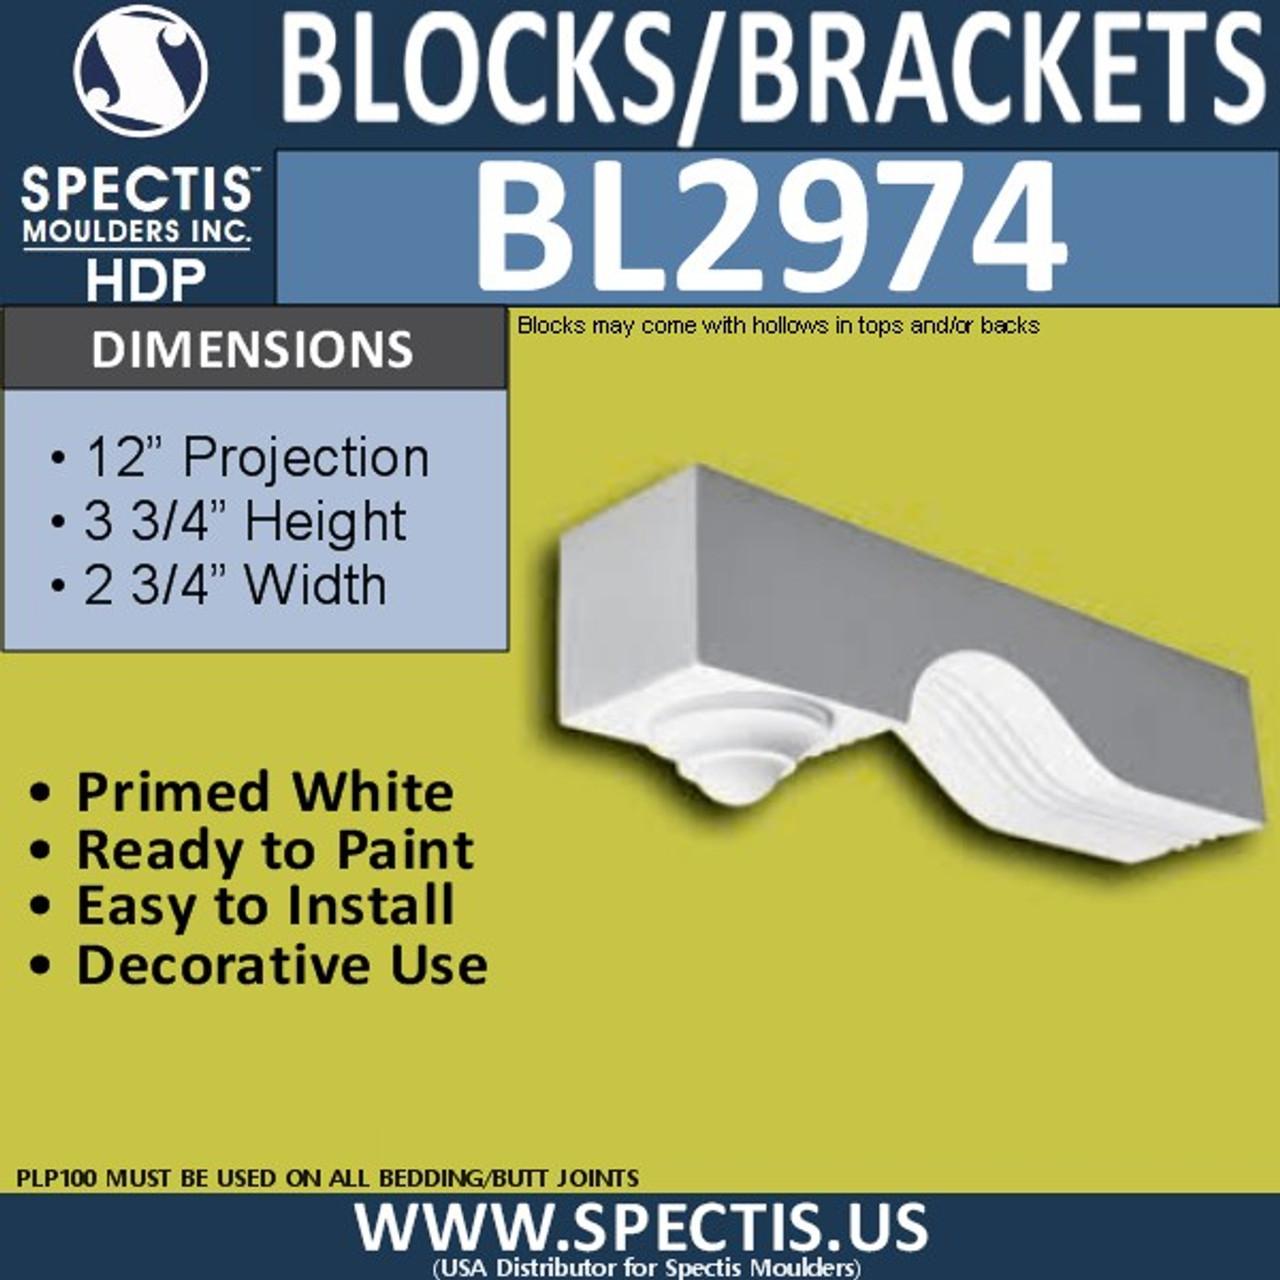 "BL2974 Eave Block or Bracket 2.75""W x 12""H x 3.75"" P"